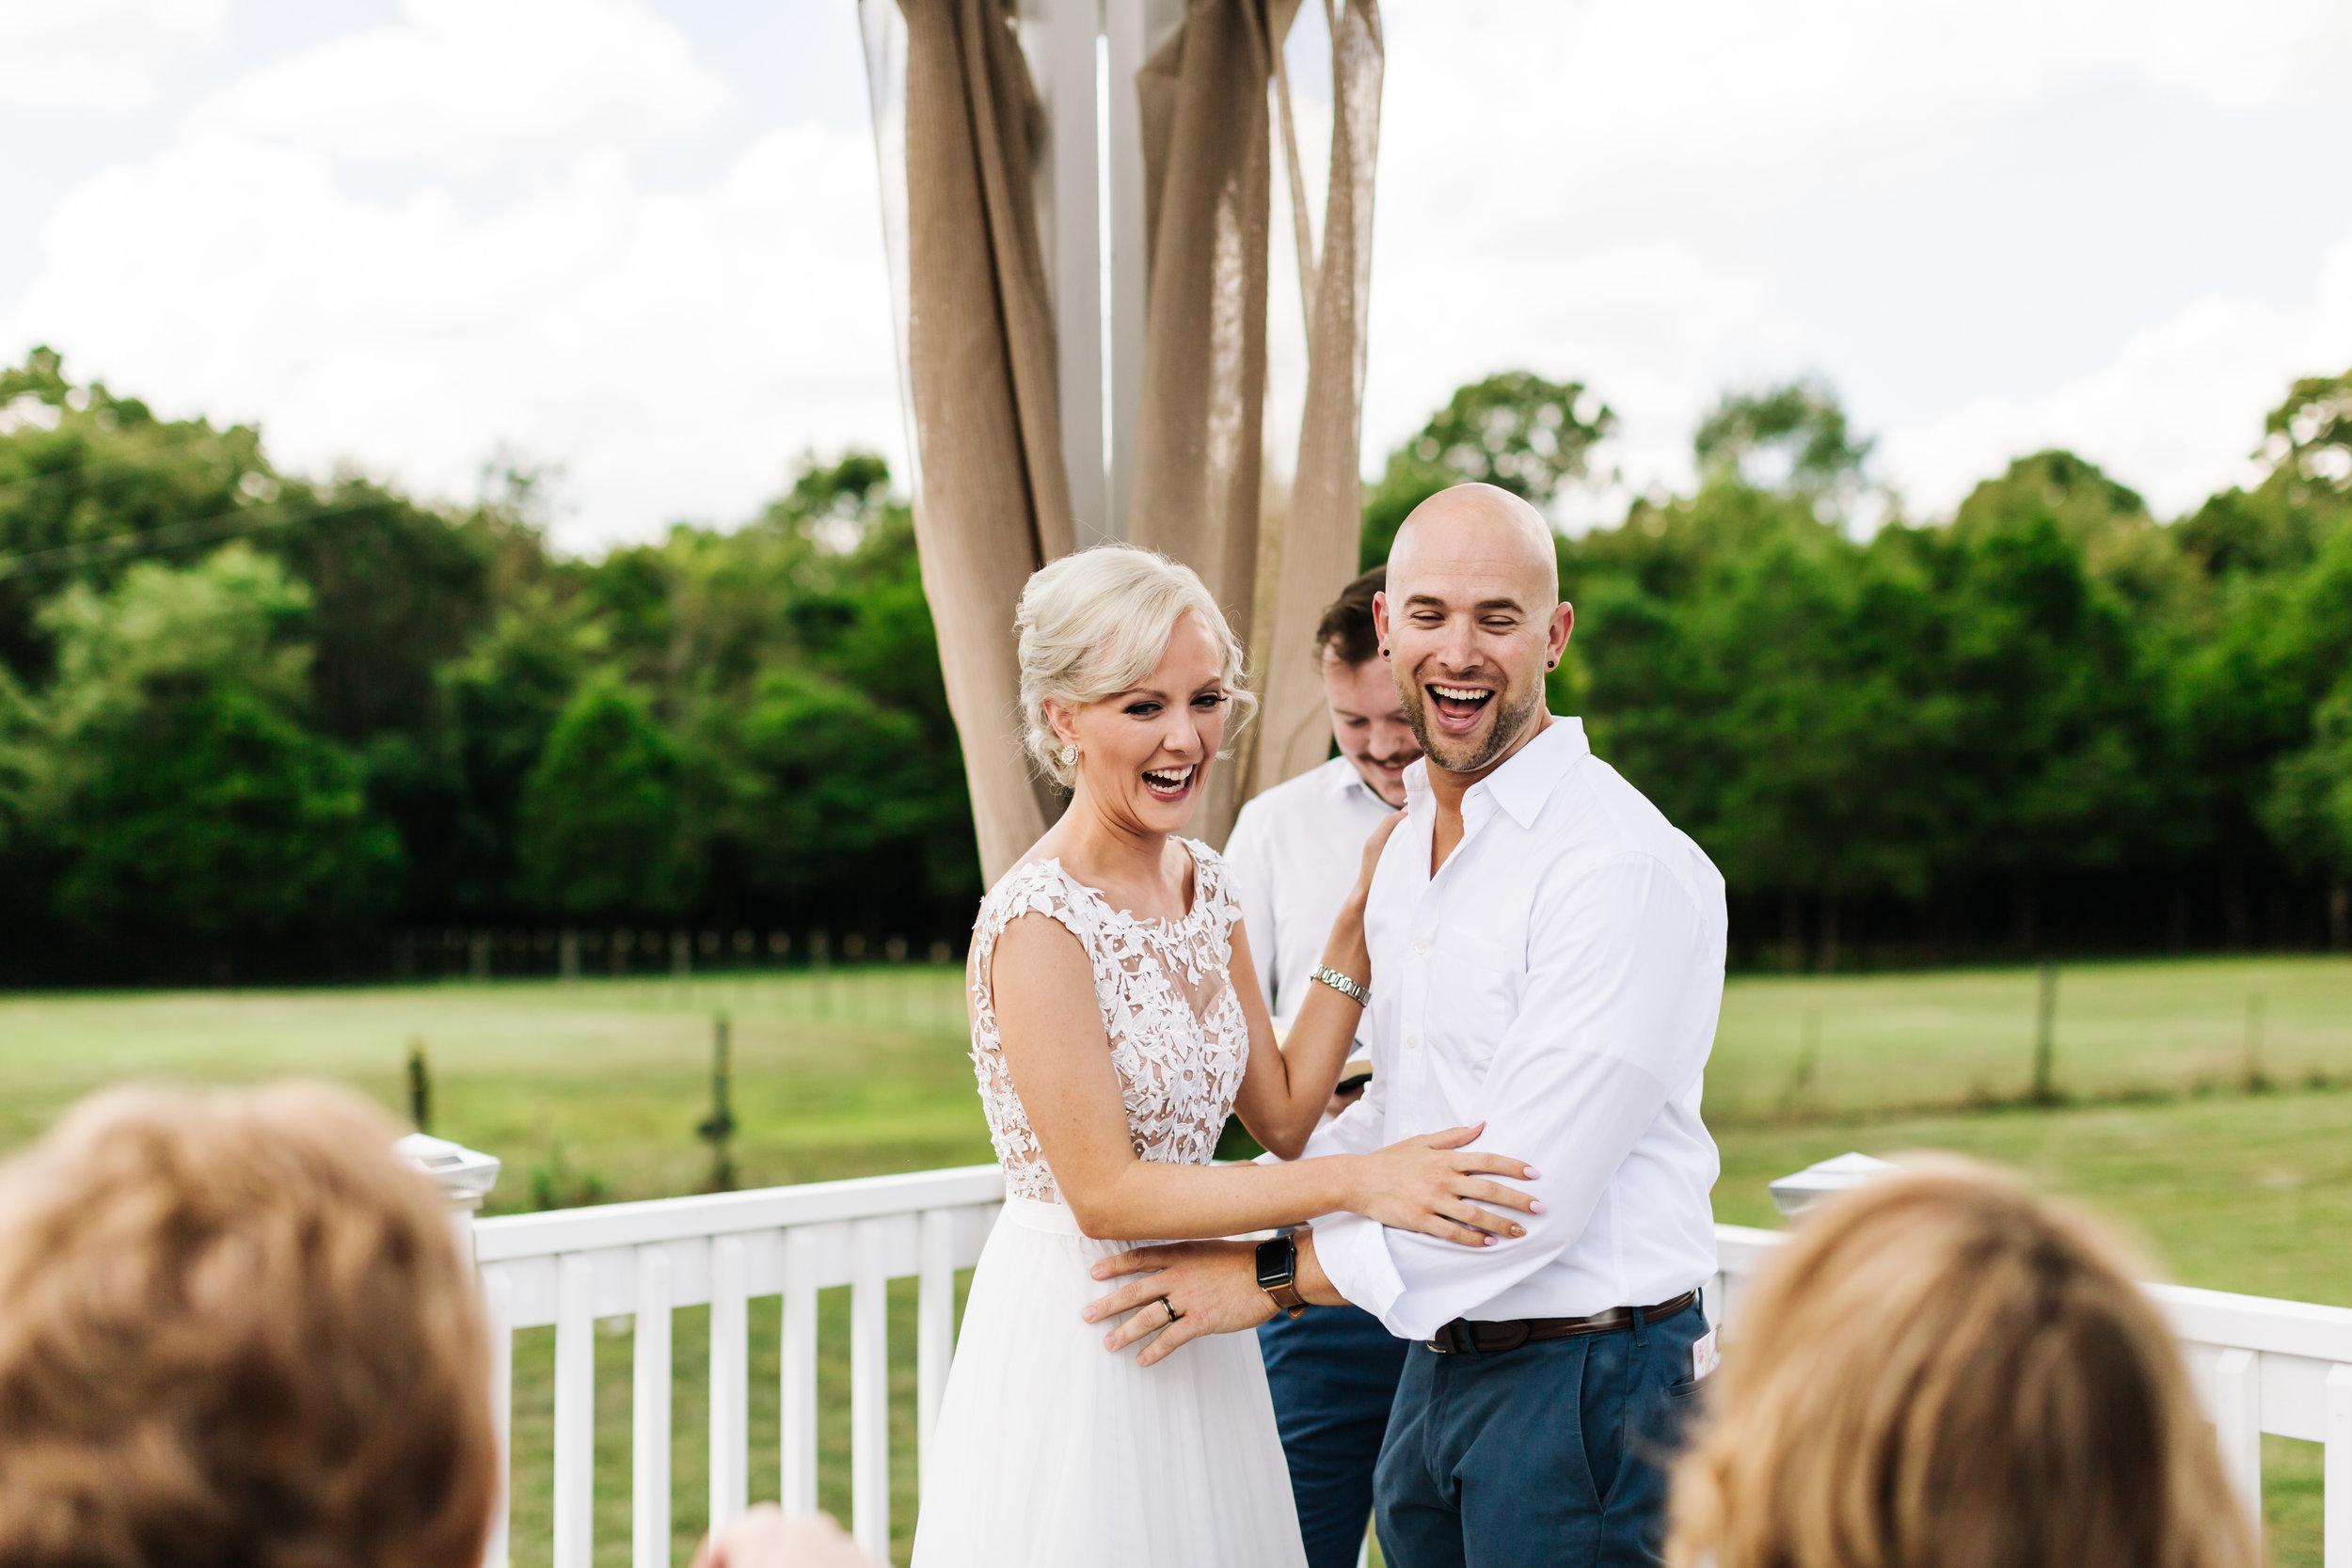 2018.09.02 Ray and Sarah Prizner Nashville TN Wedding FINALS-301.jpg